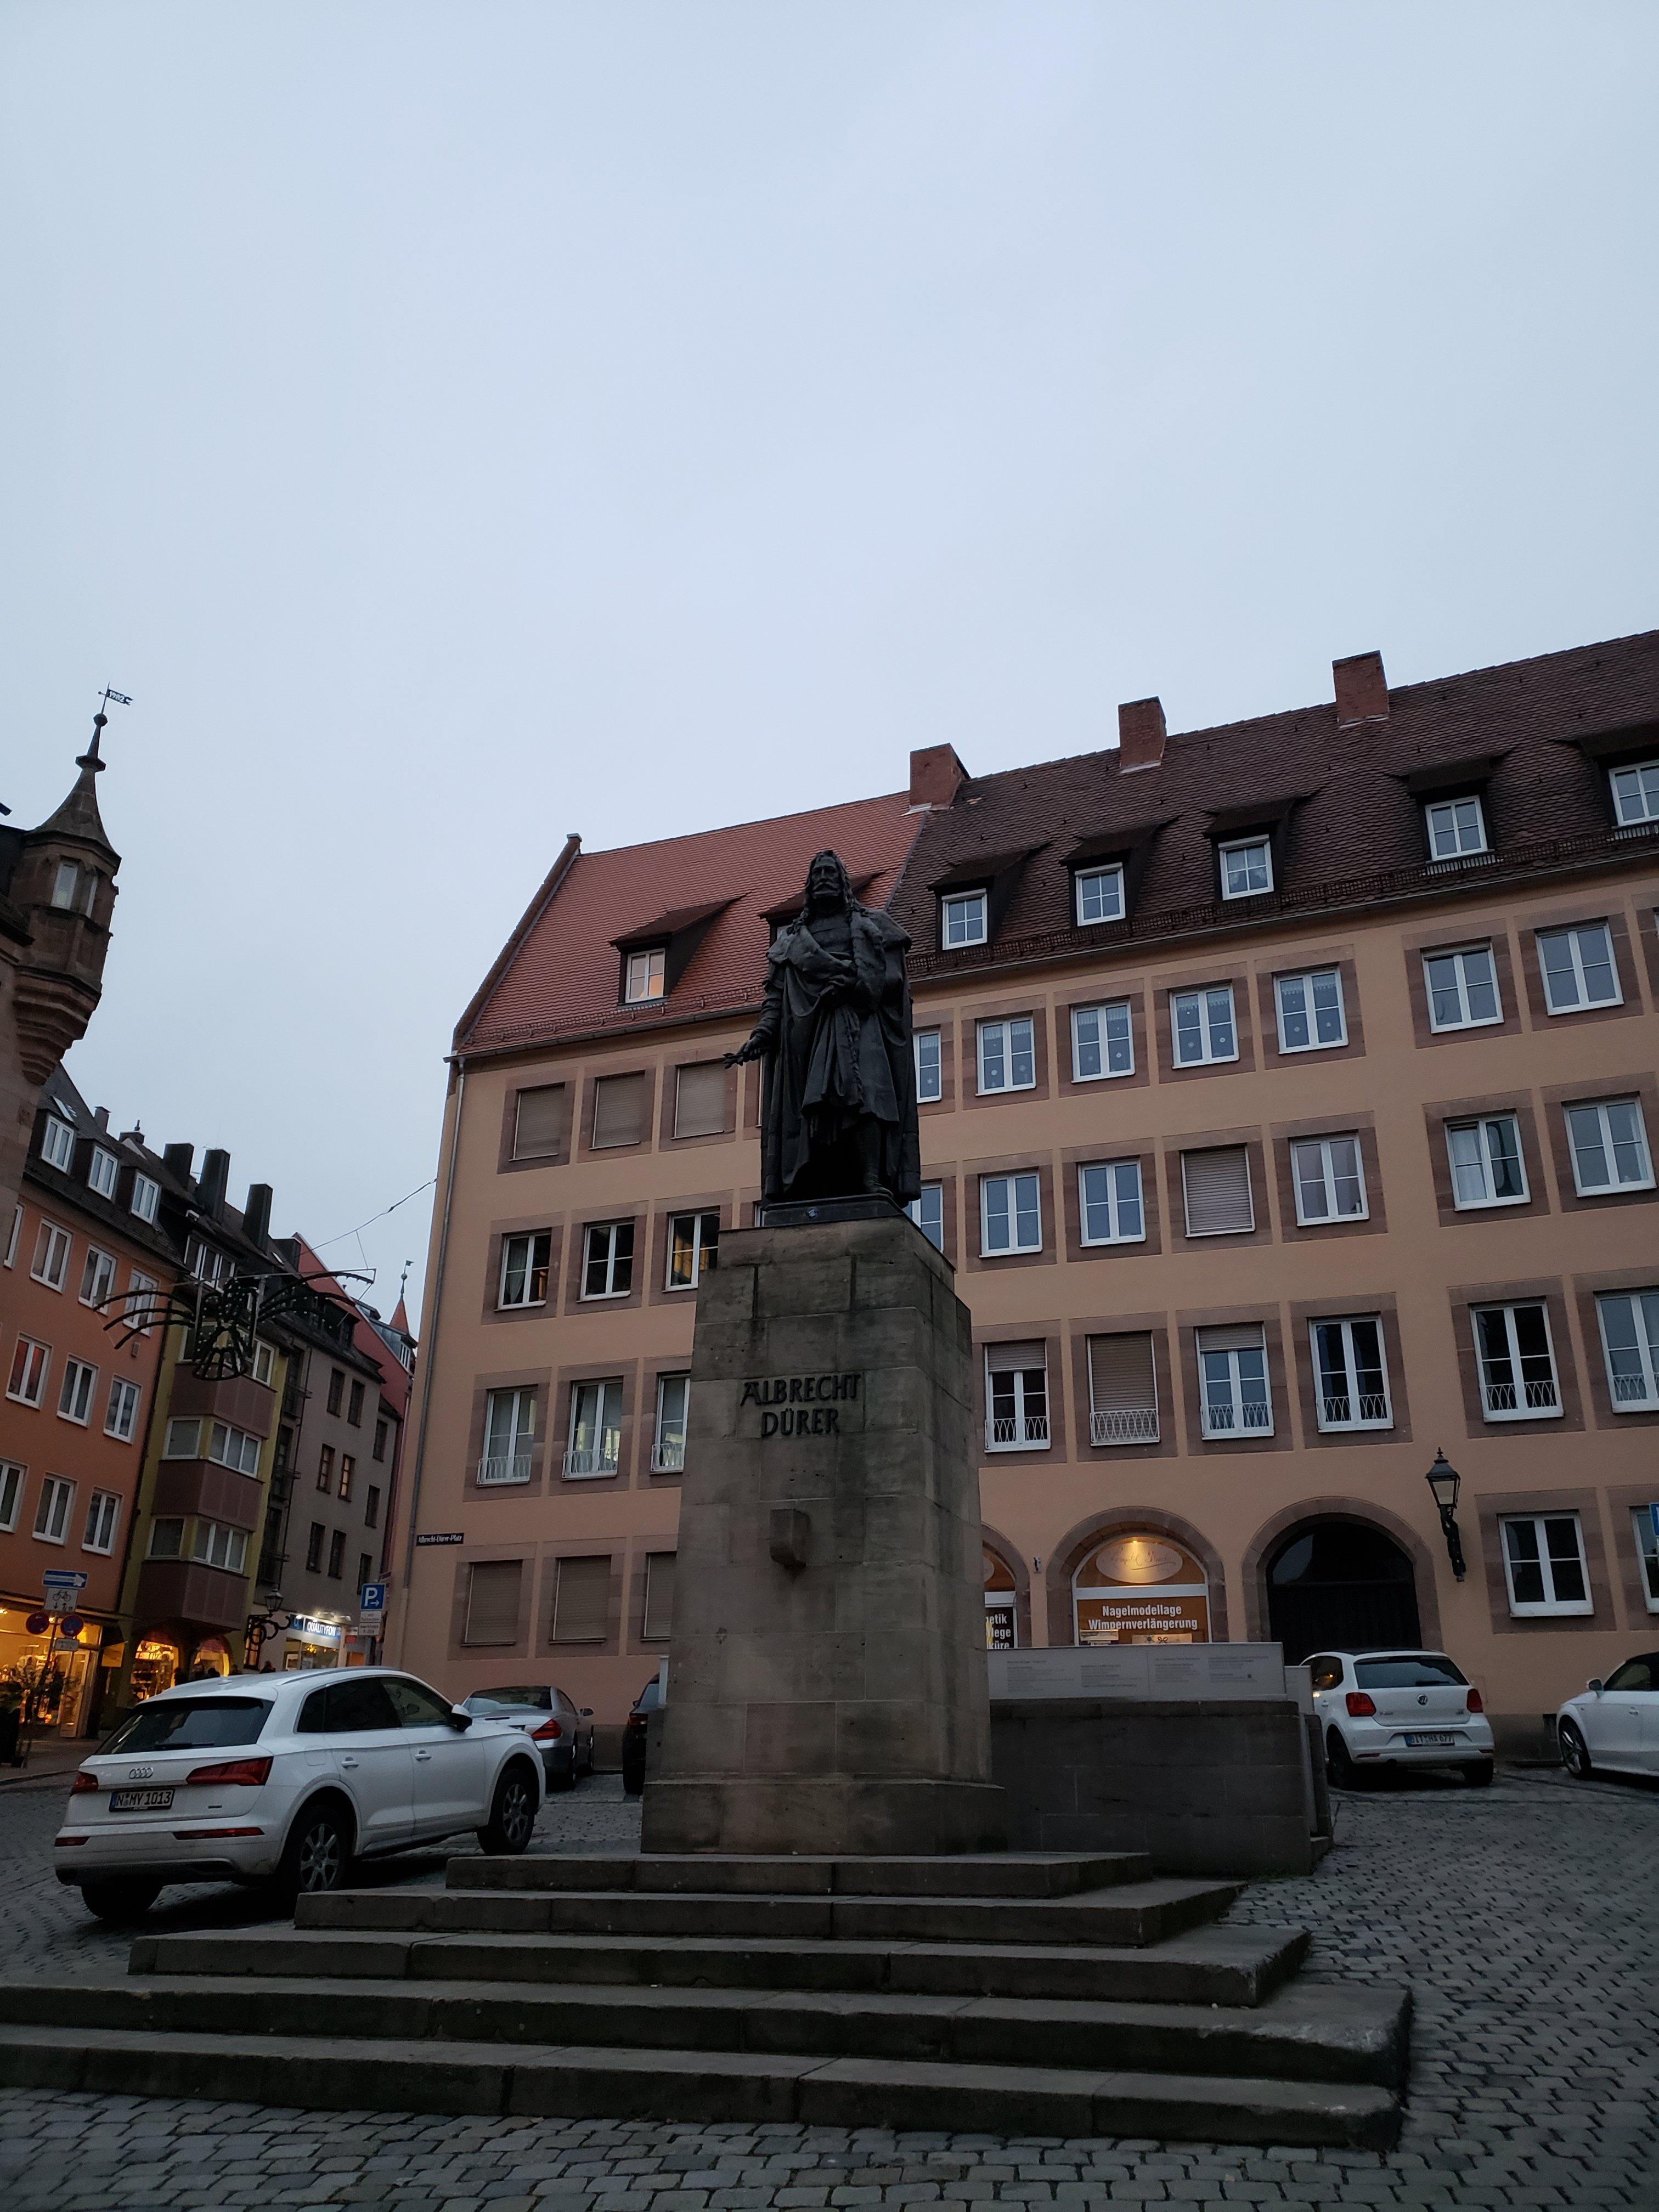 A statue of Albrecht Dürer in Nuremberg.